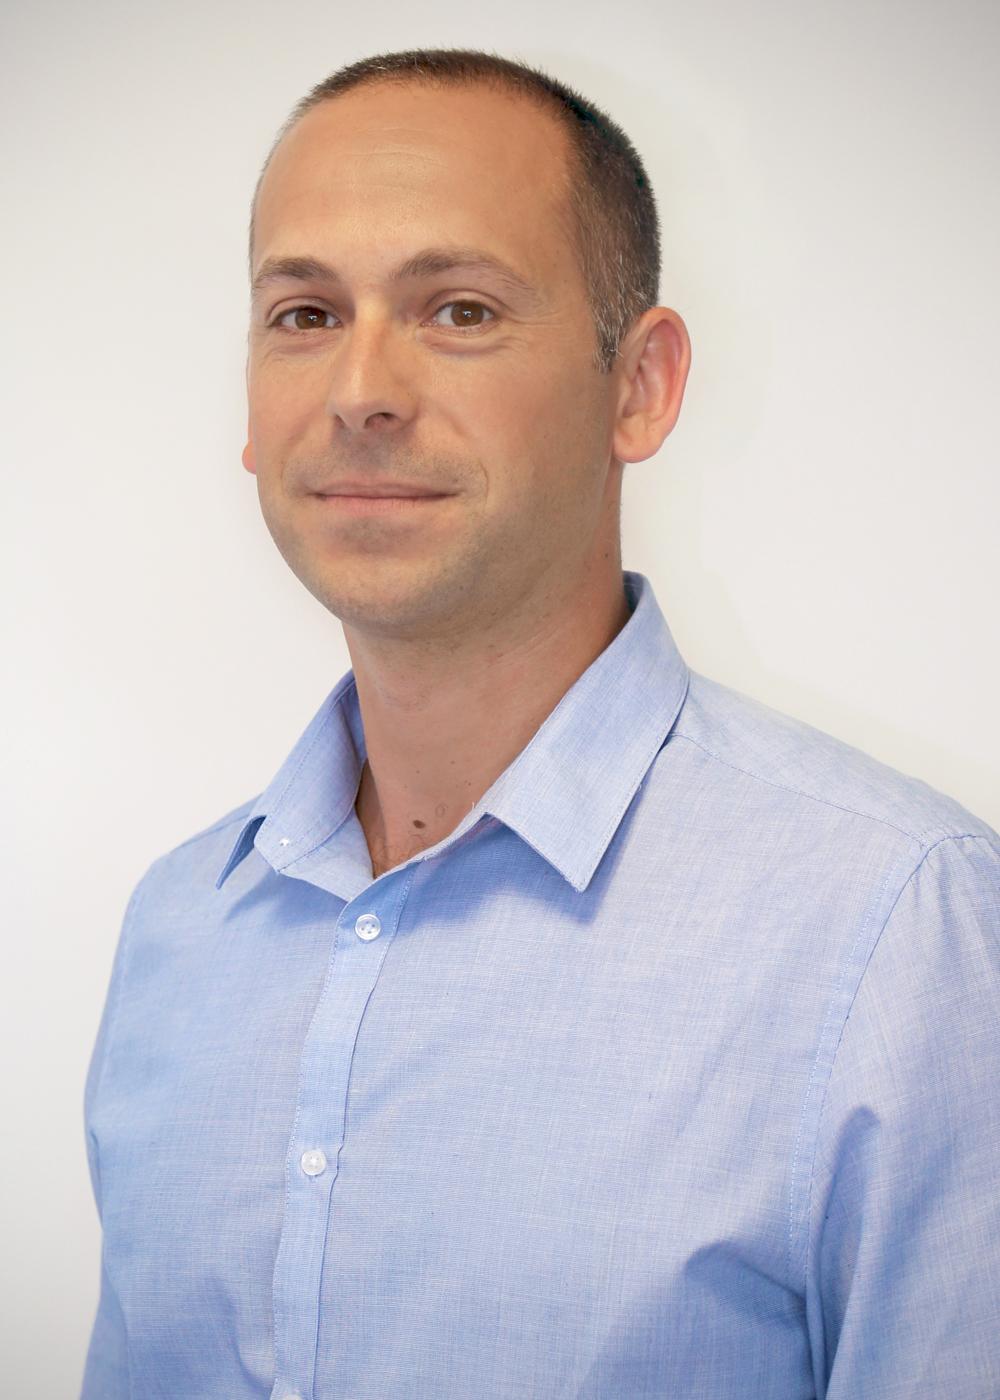 Romain-Boissin_Enseignant-chercheur-montpellier-management